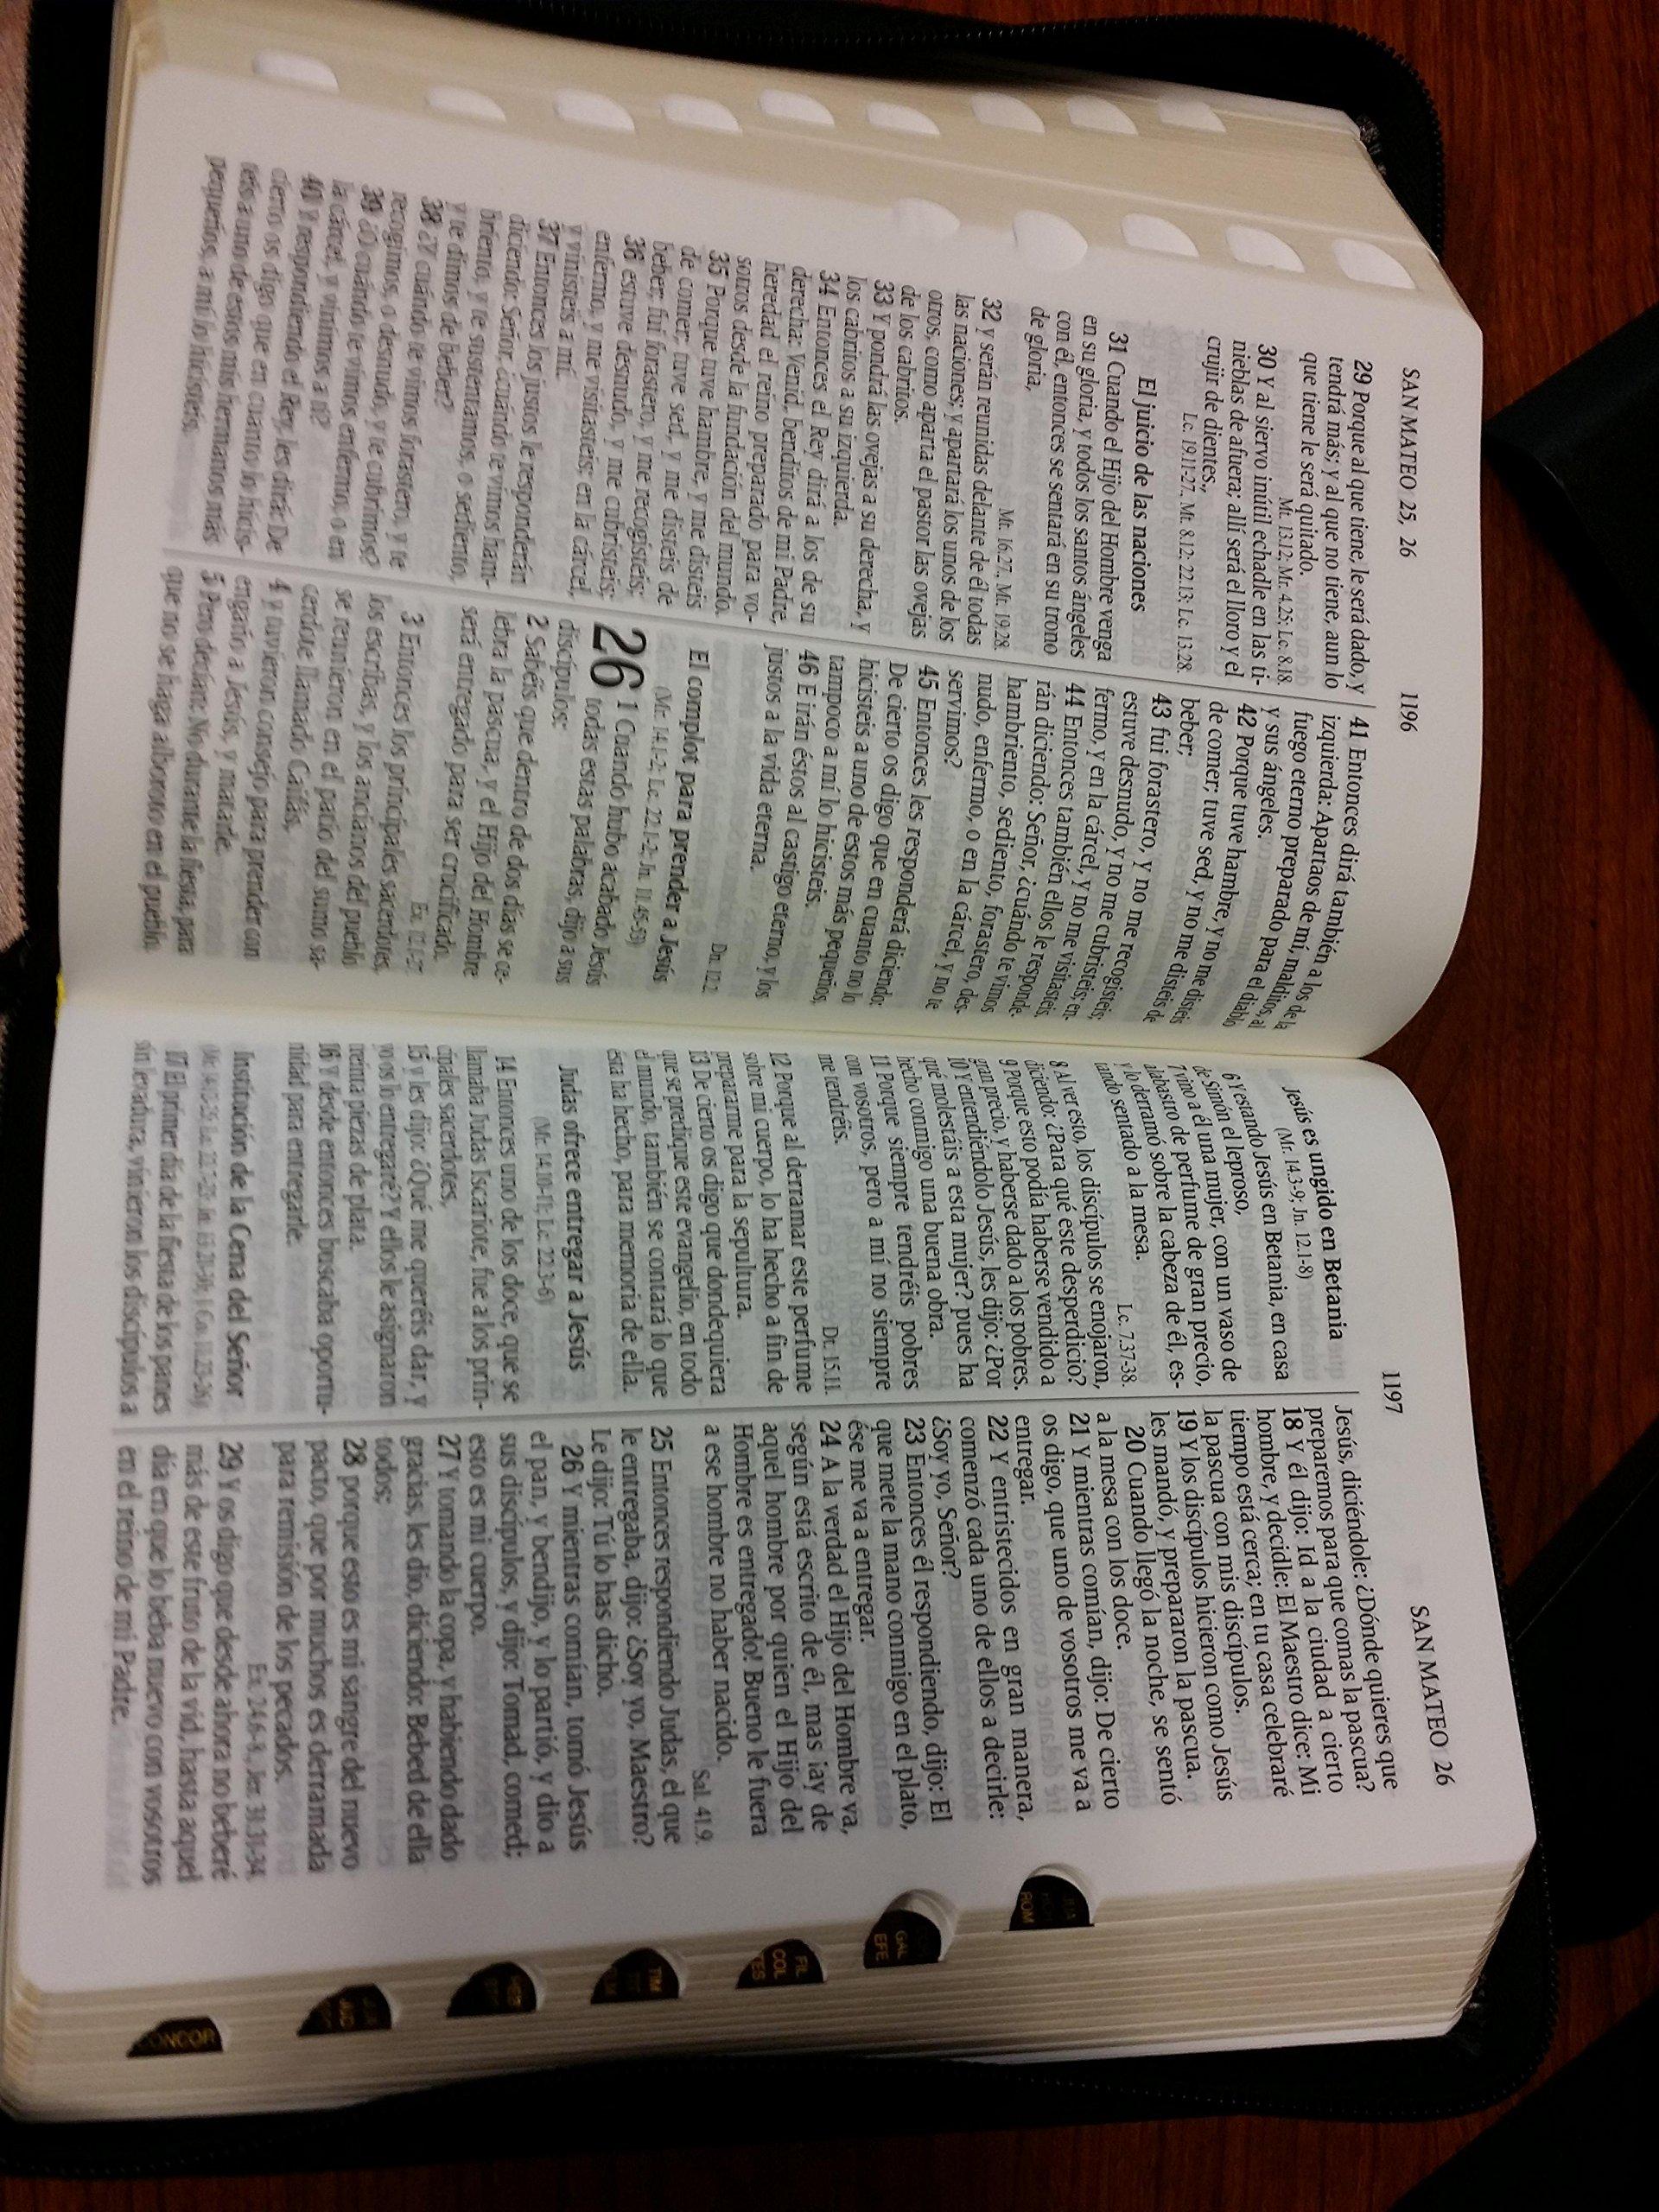 BIBLIA LETRA GRANDE TAMAÑO MANUAL REINA VALERA 1960 CON INDICE: Reina Valera 1960: 9789587451535: Amazon.com: Books